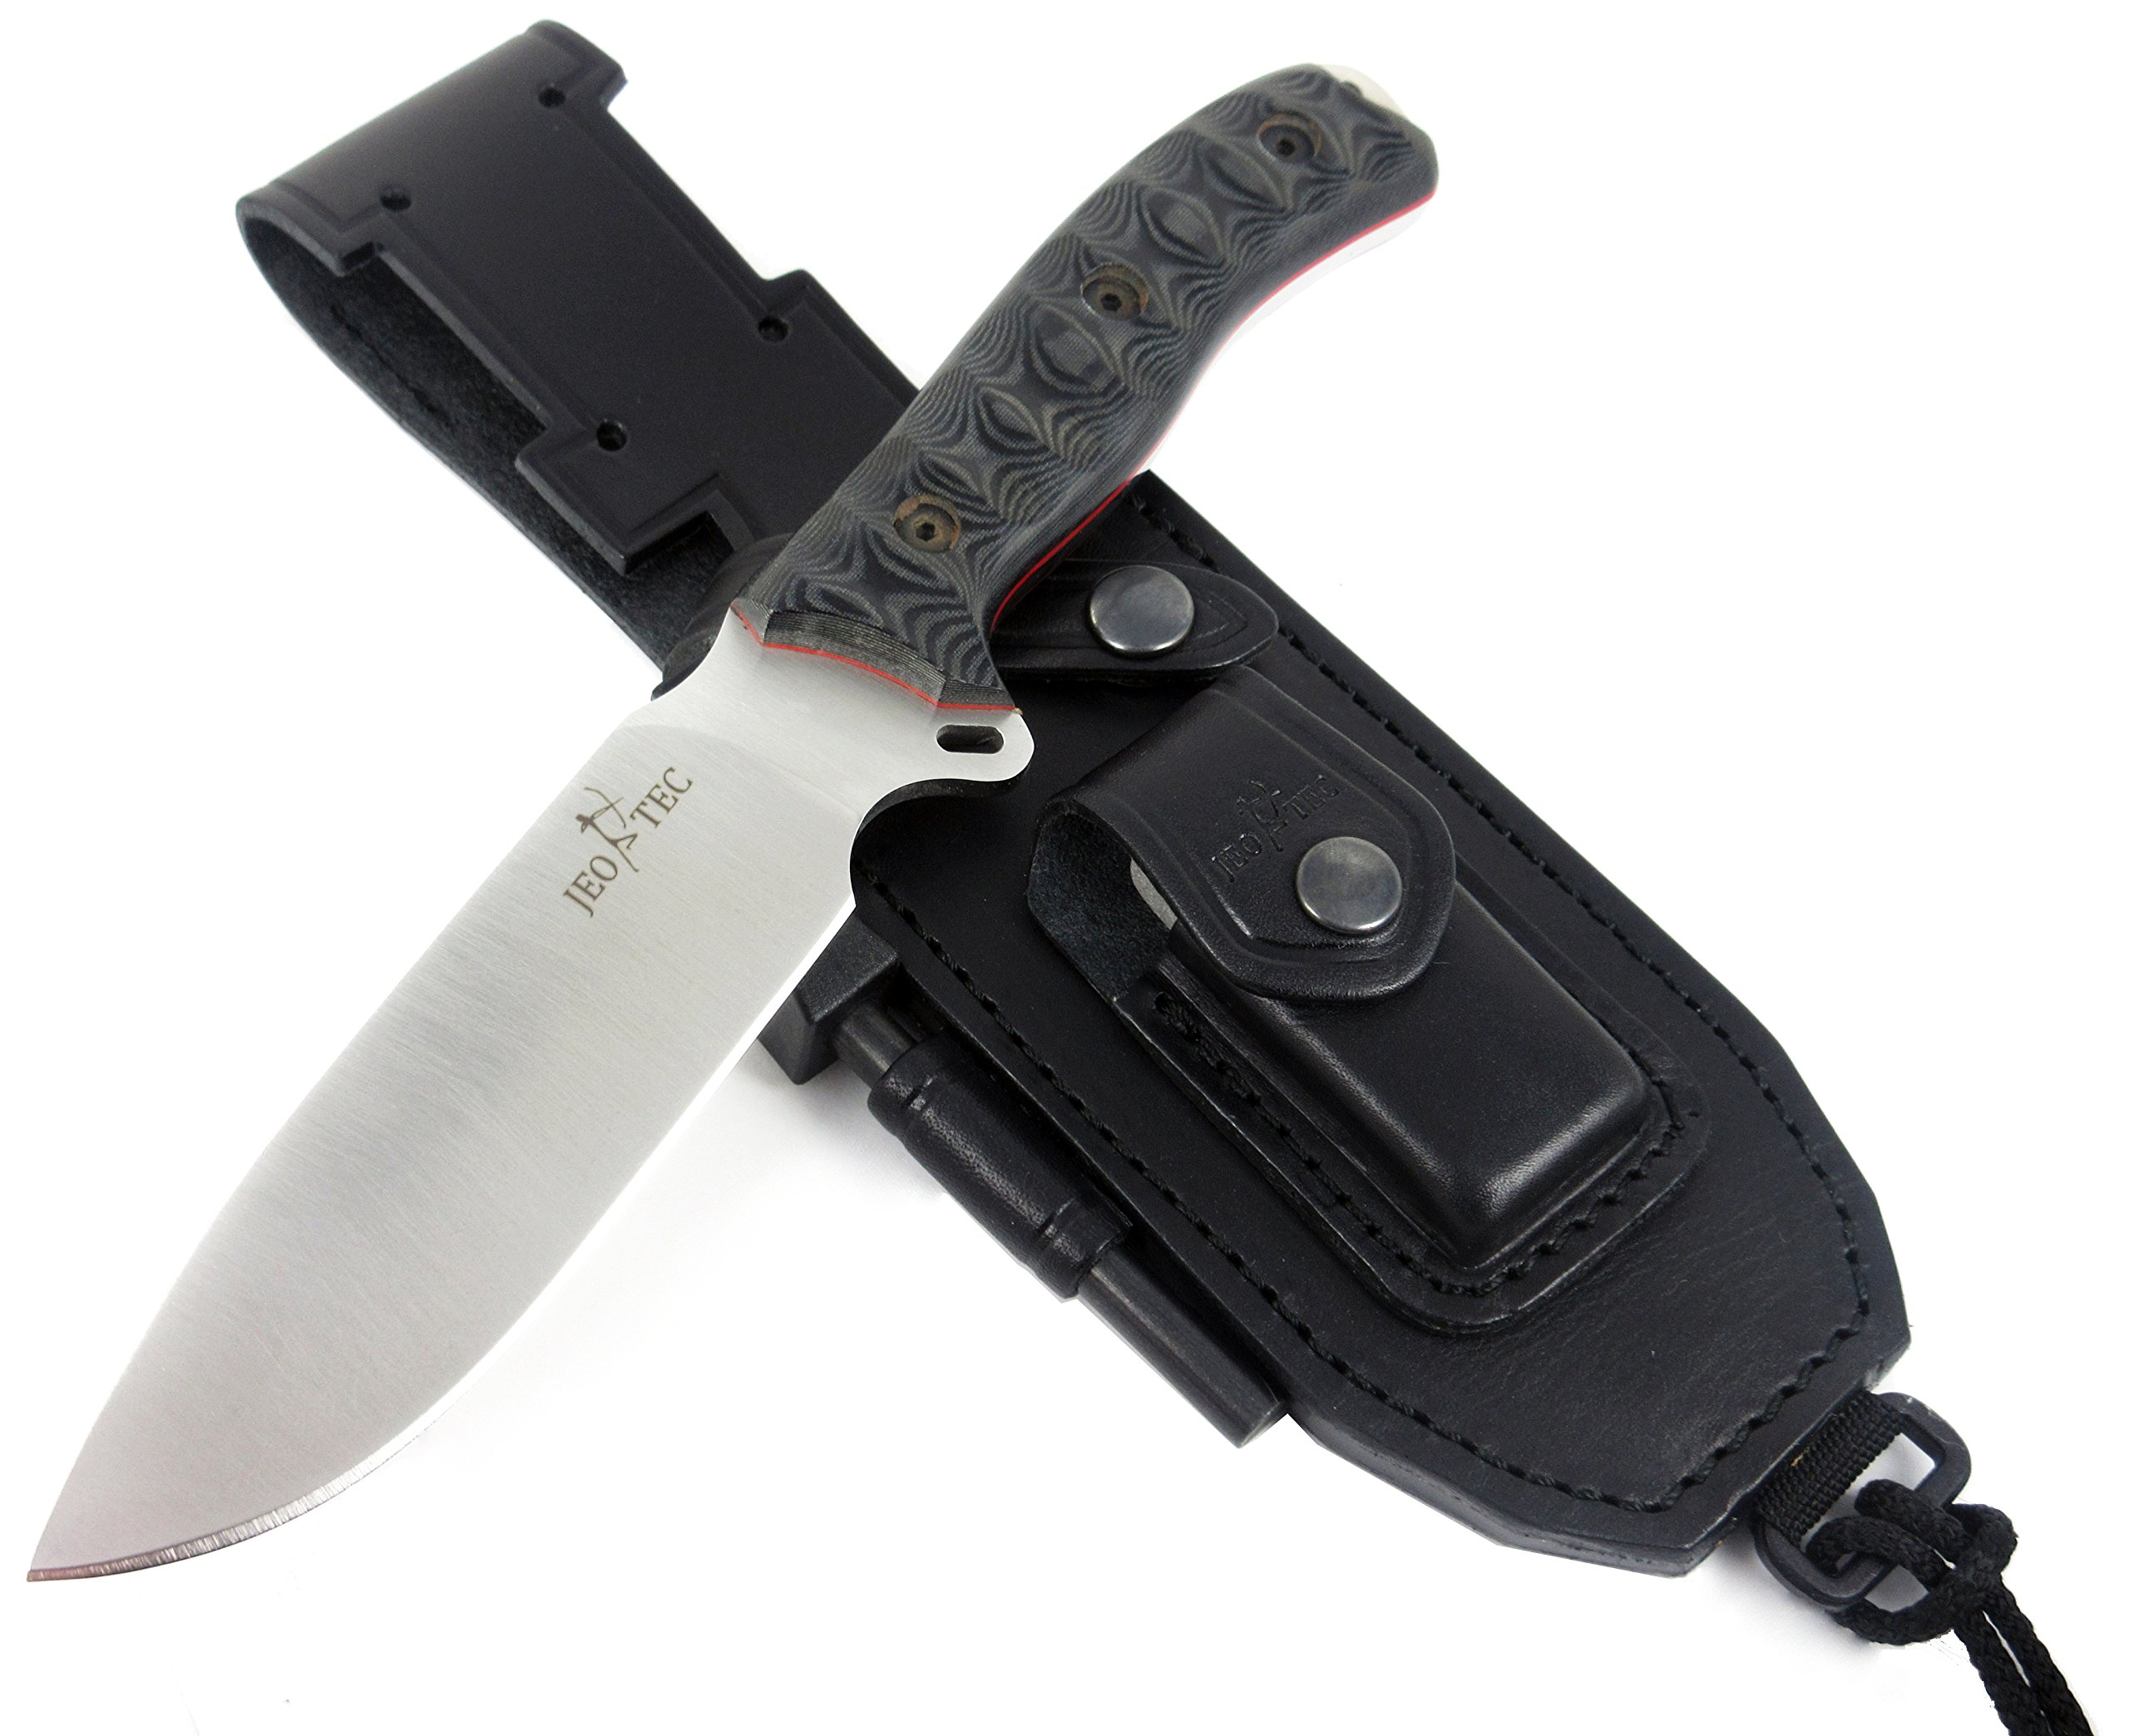 JEO-TEC Nº7 Outdoor, Survival, Hunting Knife - BOHLER N690C Stainless Steel, Multi-positioned Leather Sheath, Sharpener Stone & Firesteel - Handmade in Spain